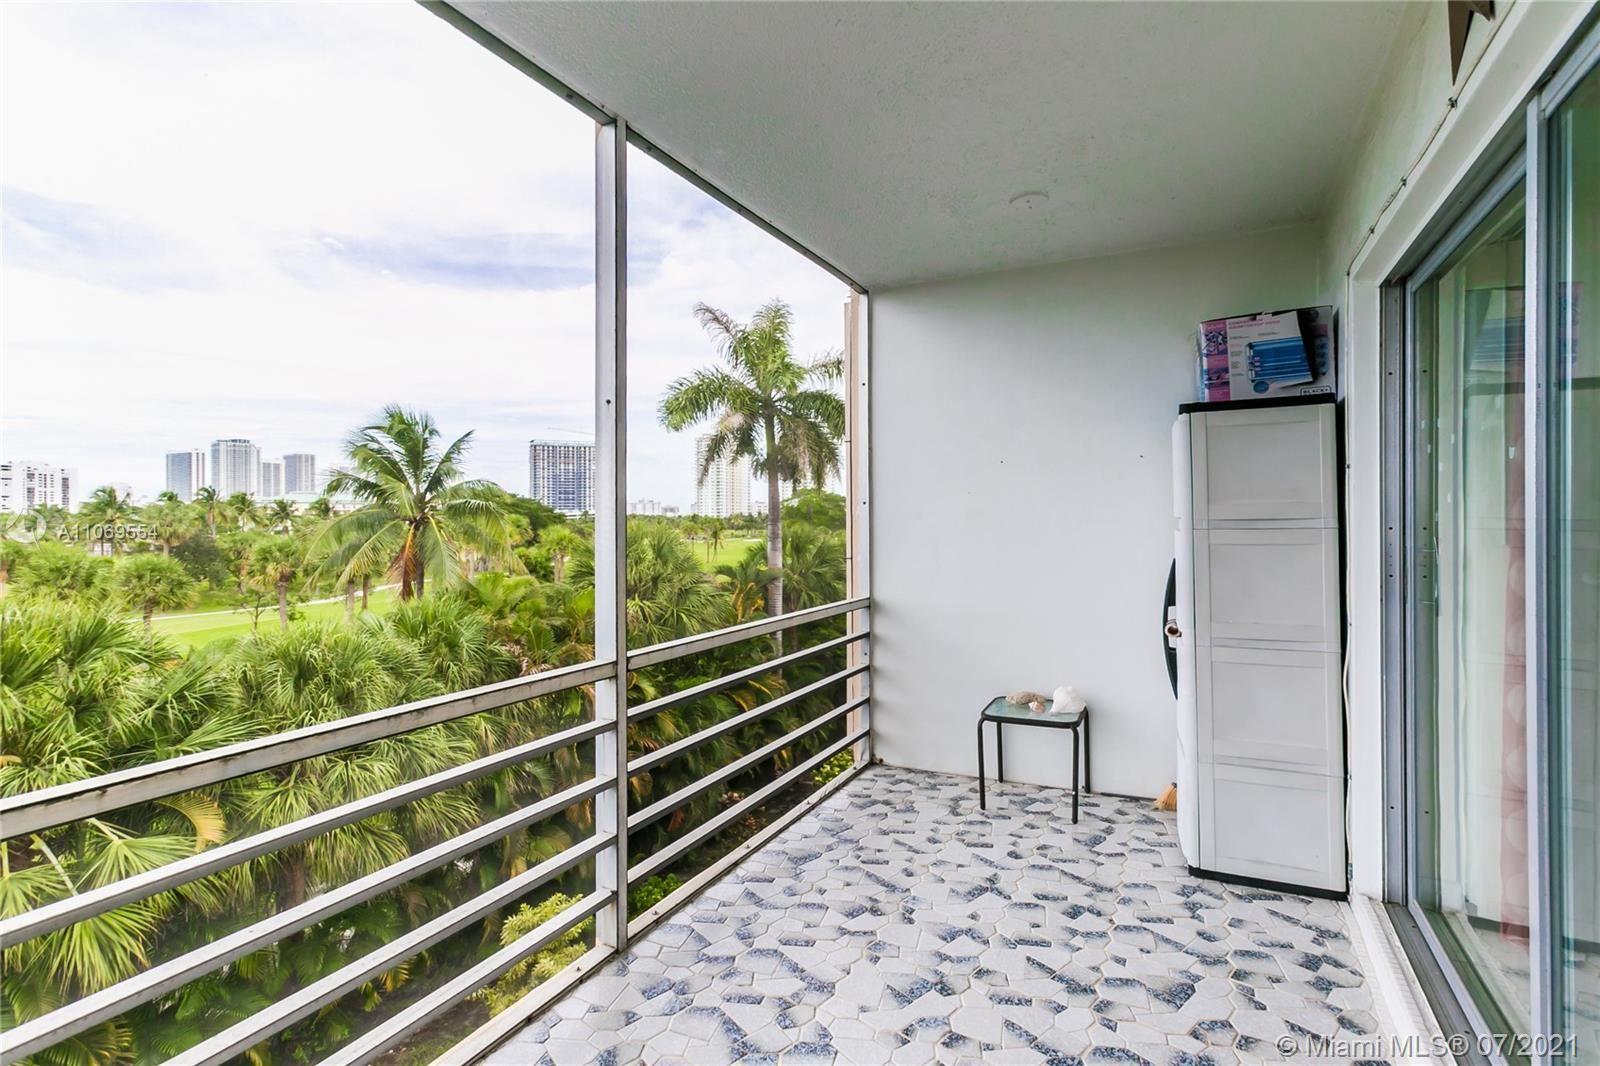 Photo of 600 NE 14th Ave #420, Hallandale Beach, FL 33009 (MLS # A11069554)